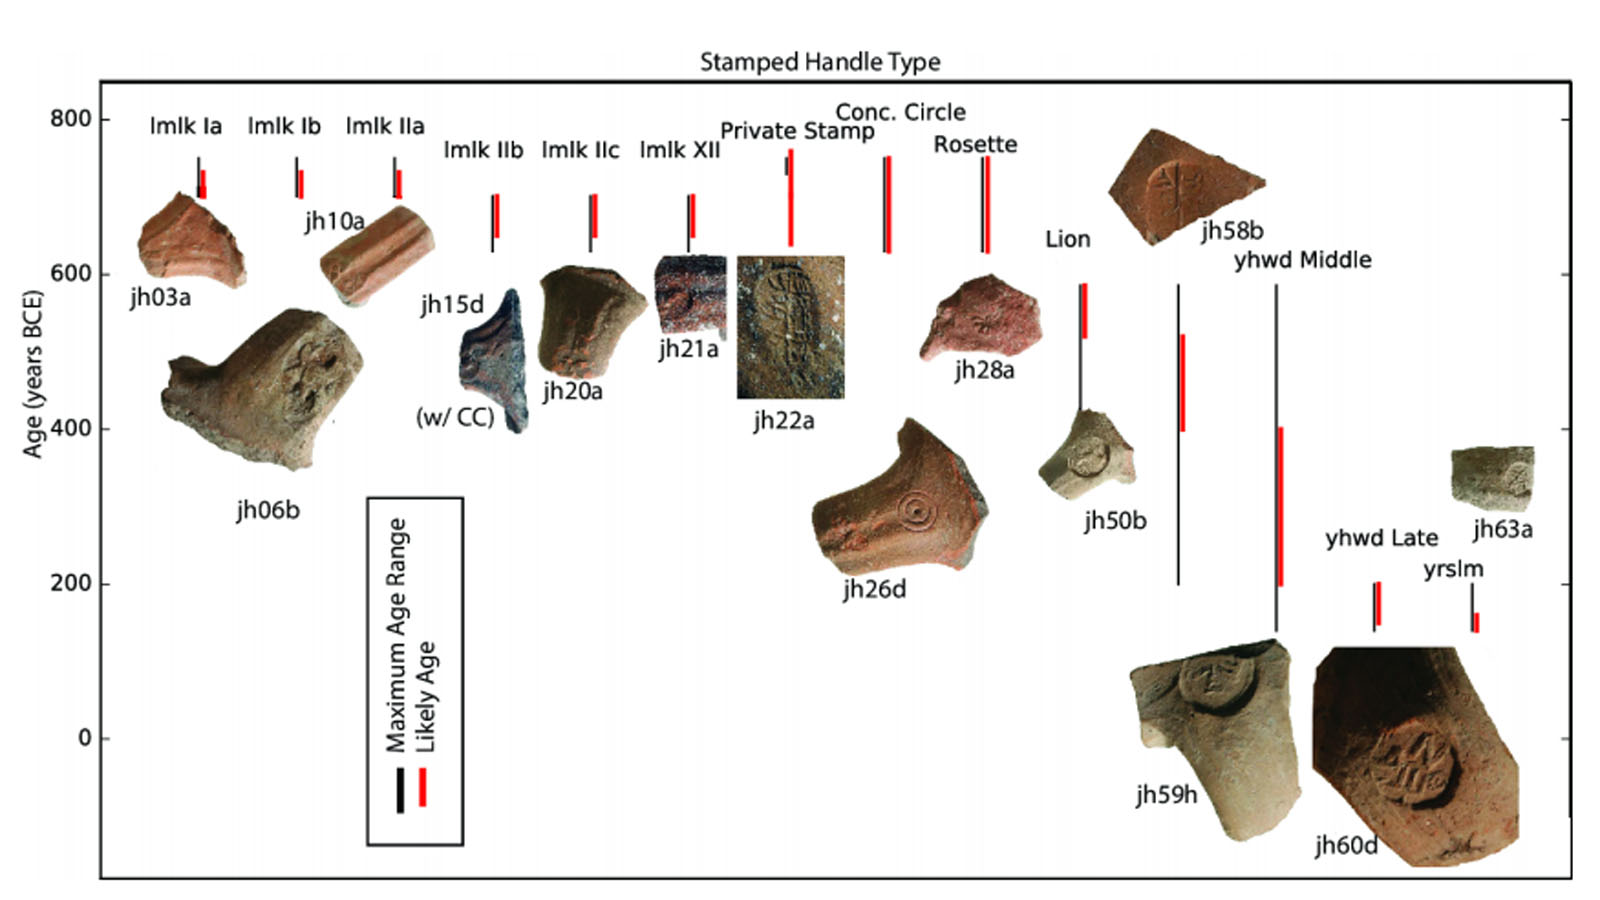 67 ancient, heat-impacted Judean ceramic storage jar handles. Photo courtesy